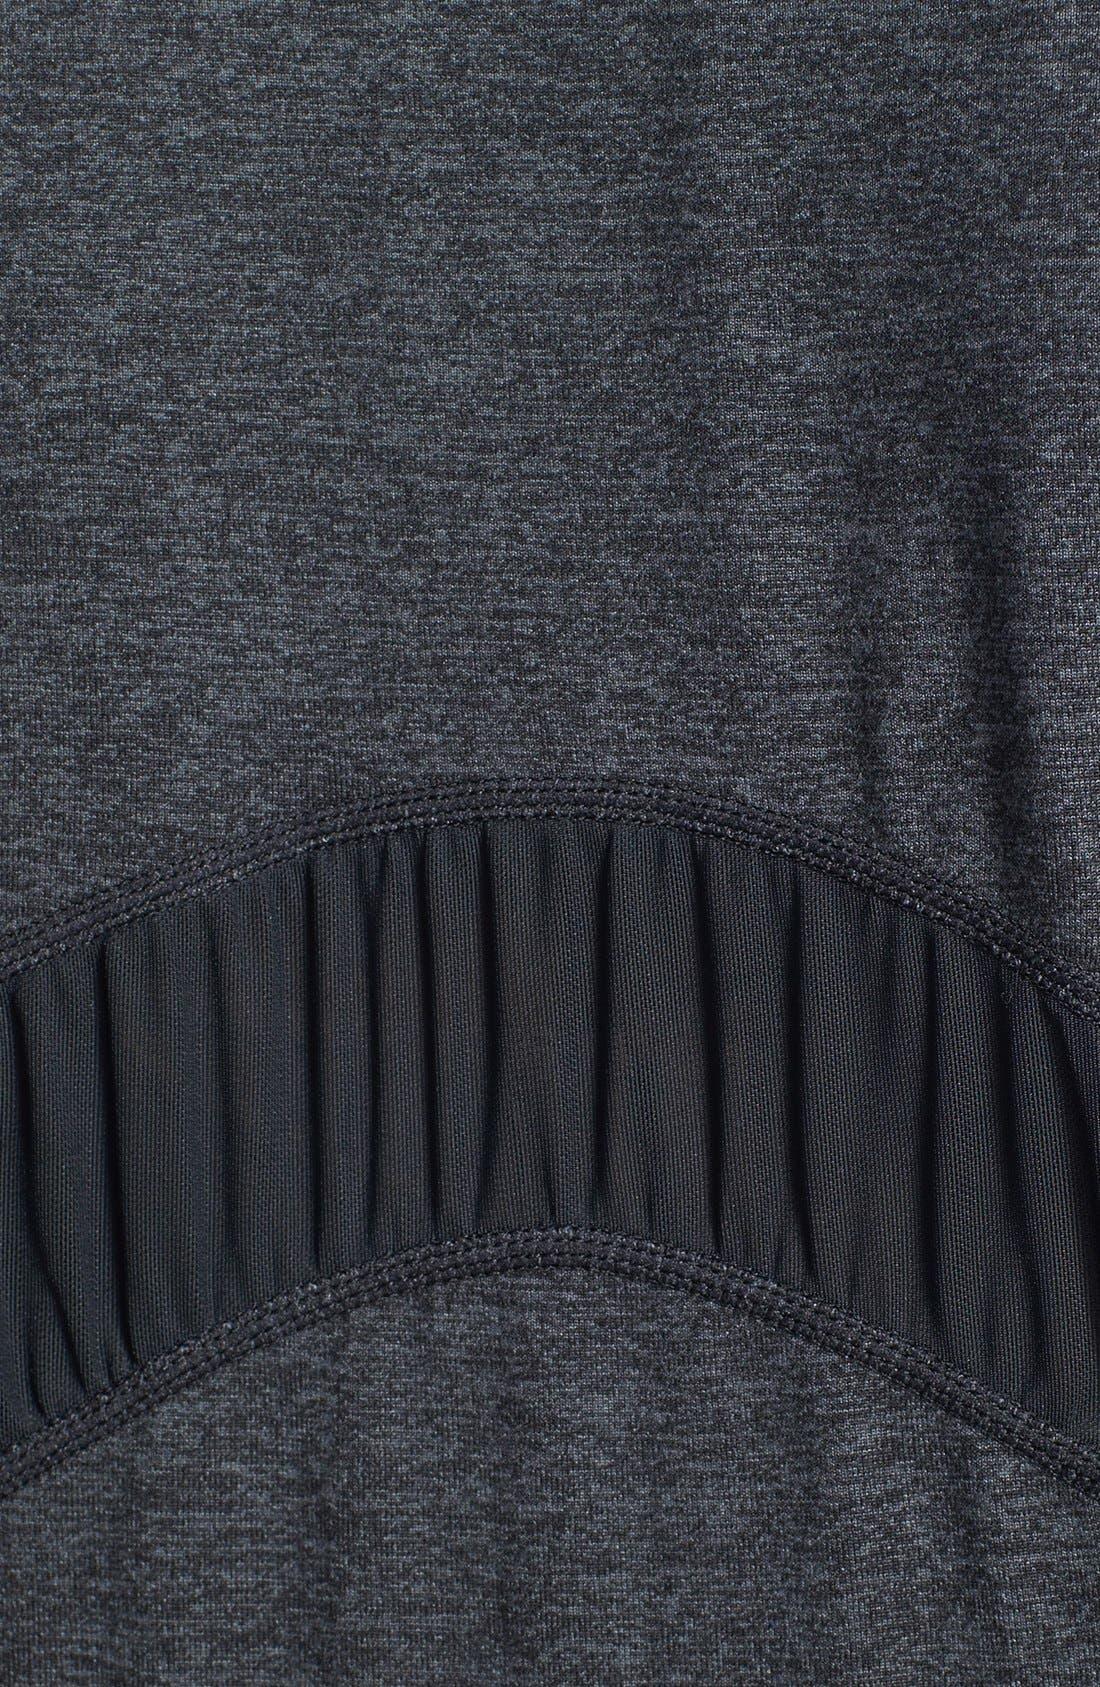 Alternate Image 3  - Zella 'Prism' Cross Dye Jacket (Plus Size)